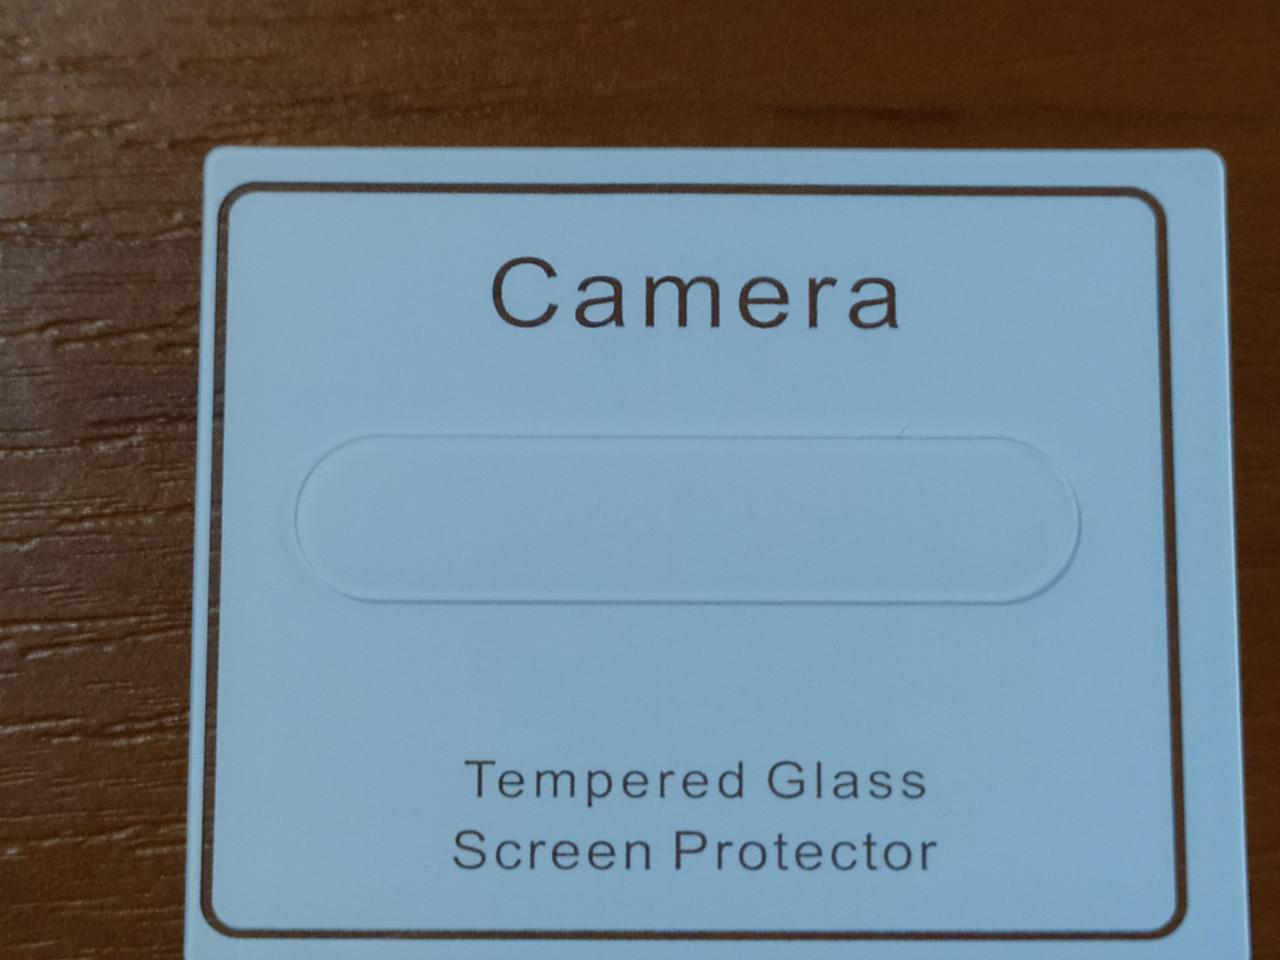 Захисне скло на камеру Tempered Glass Screen Protector Xiaomi Redmi Note 8